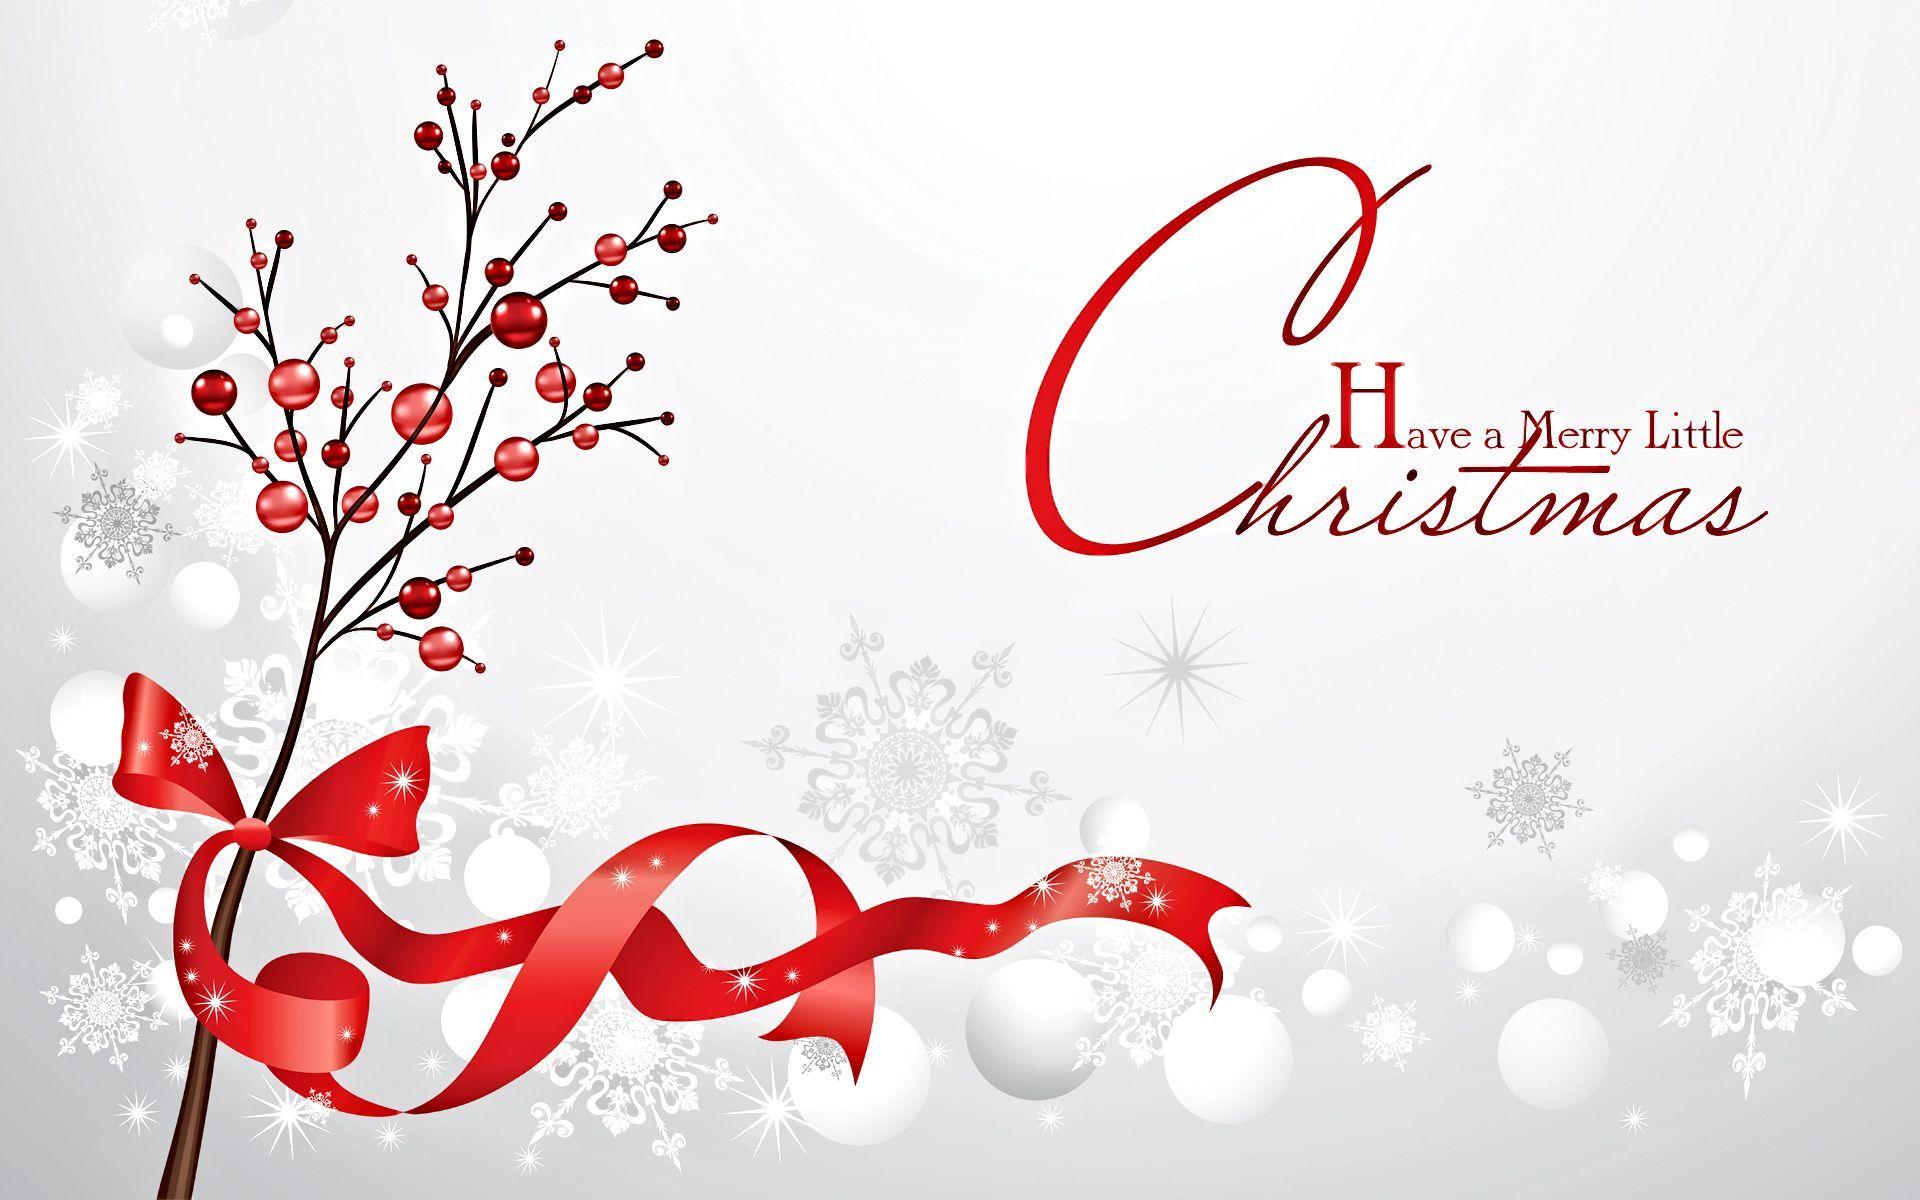 Merry Christmas Greetings Sayings